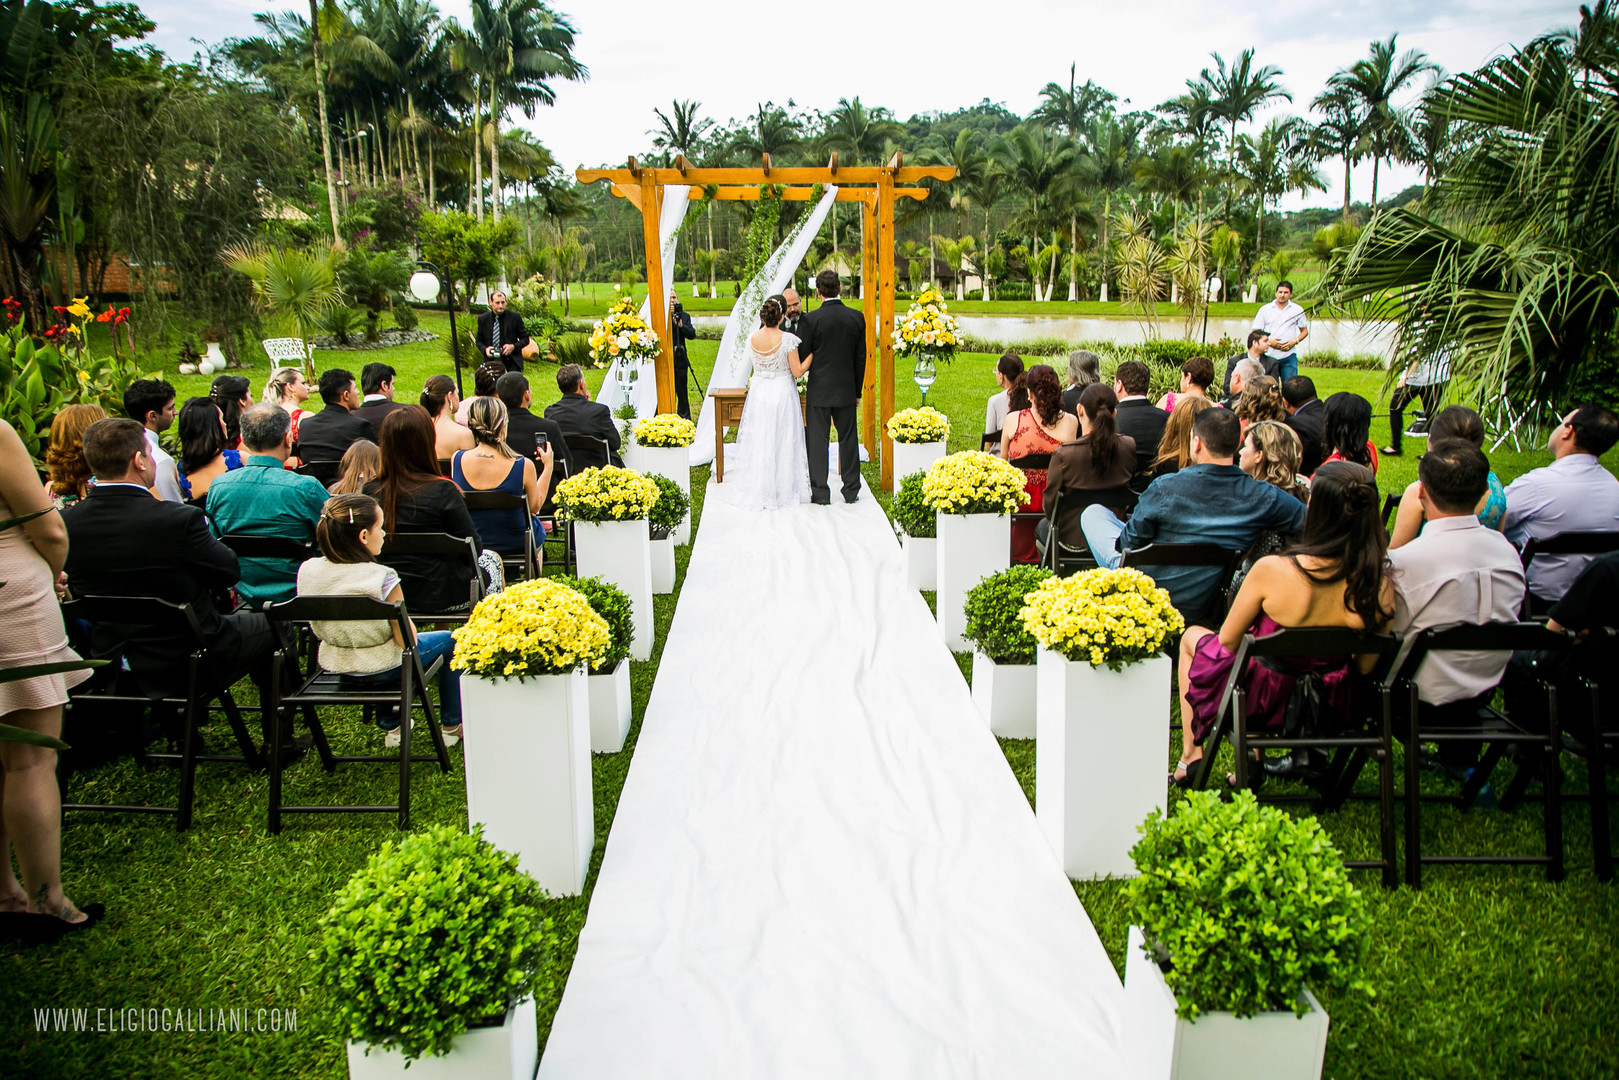 Imagem capa - Destination Wedding por Eligio Galliani Fotografia